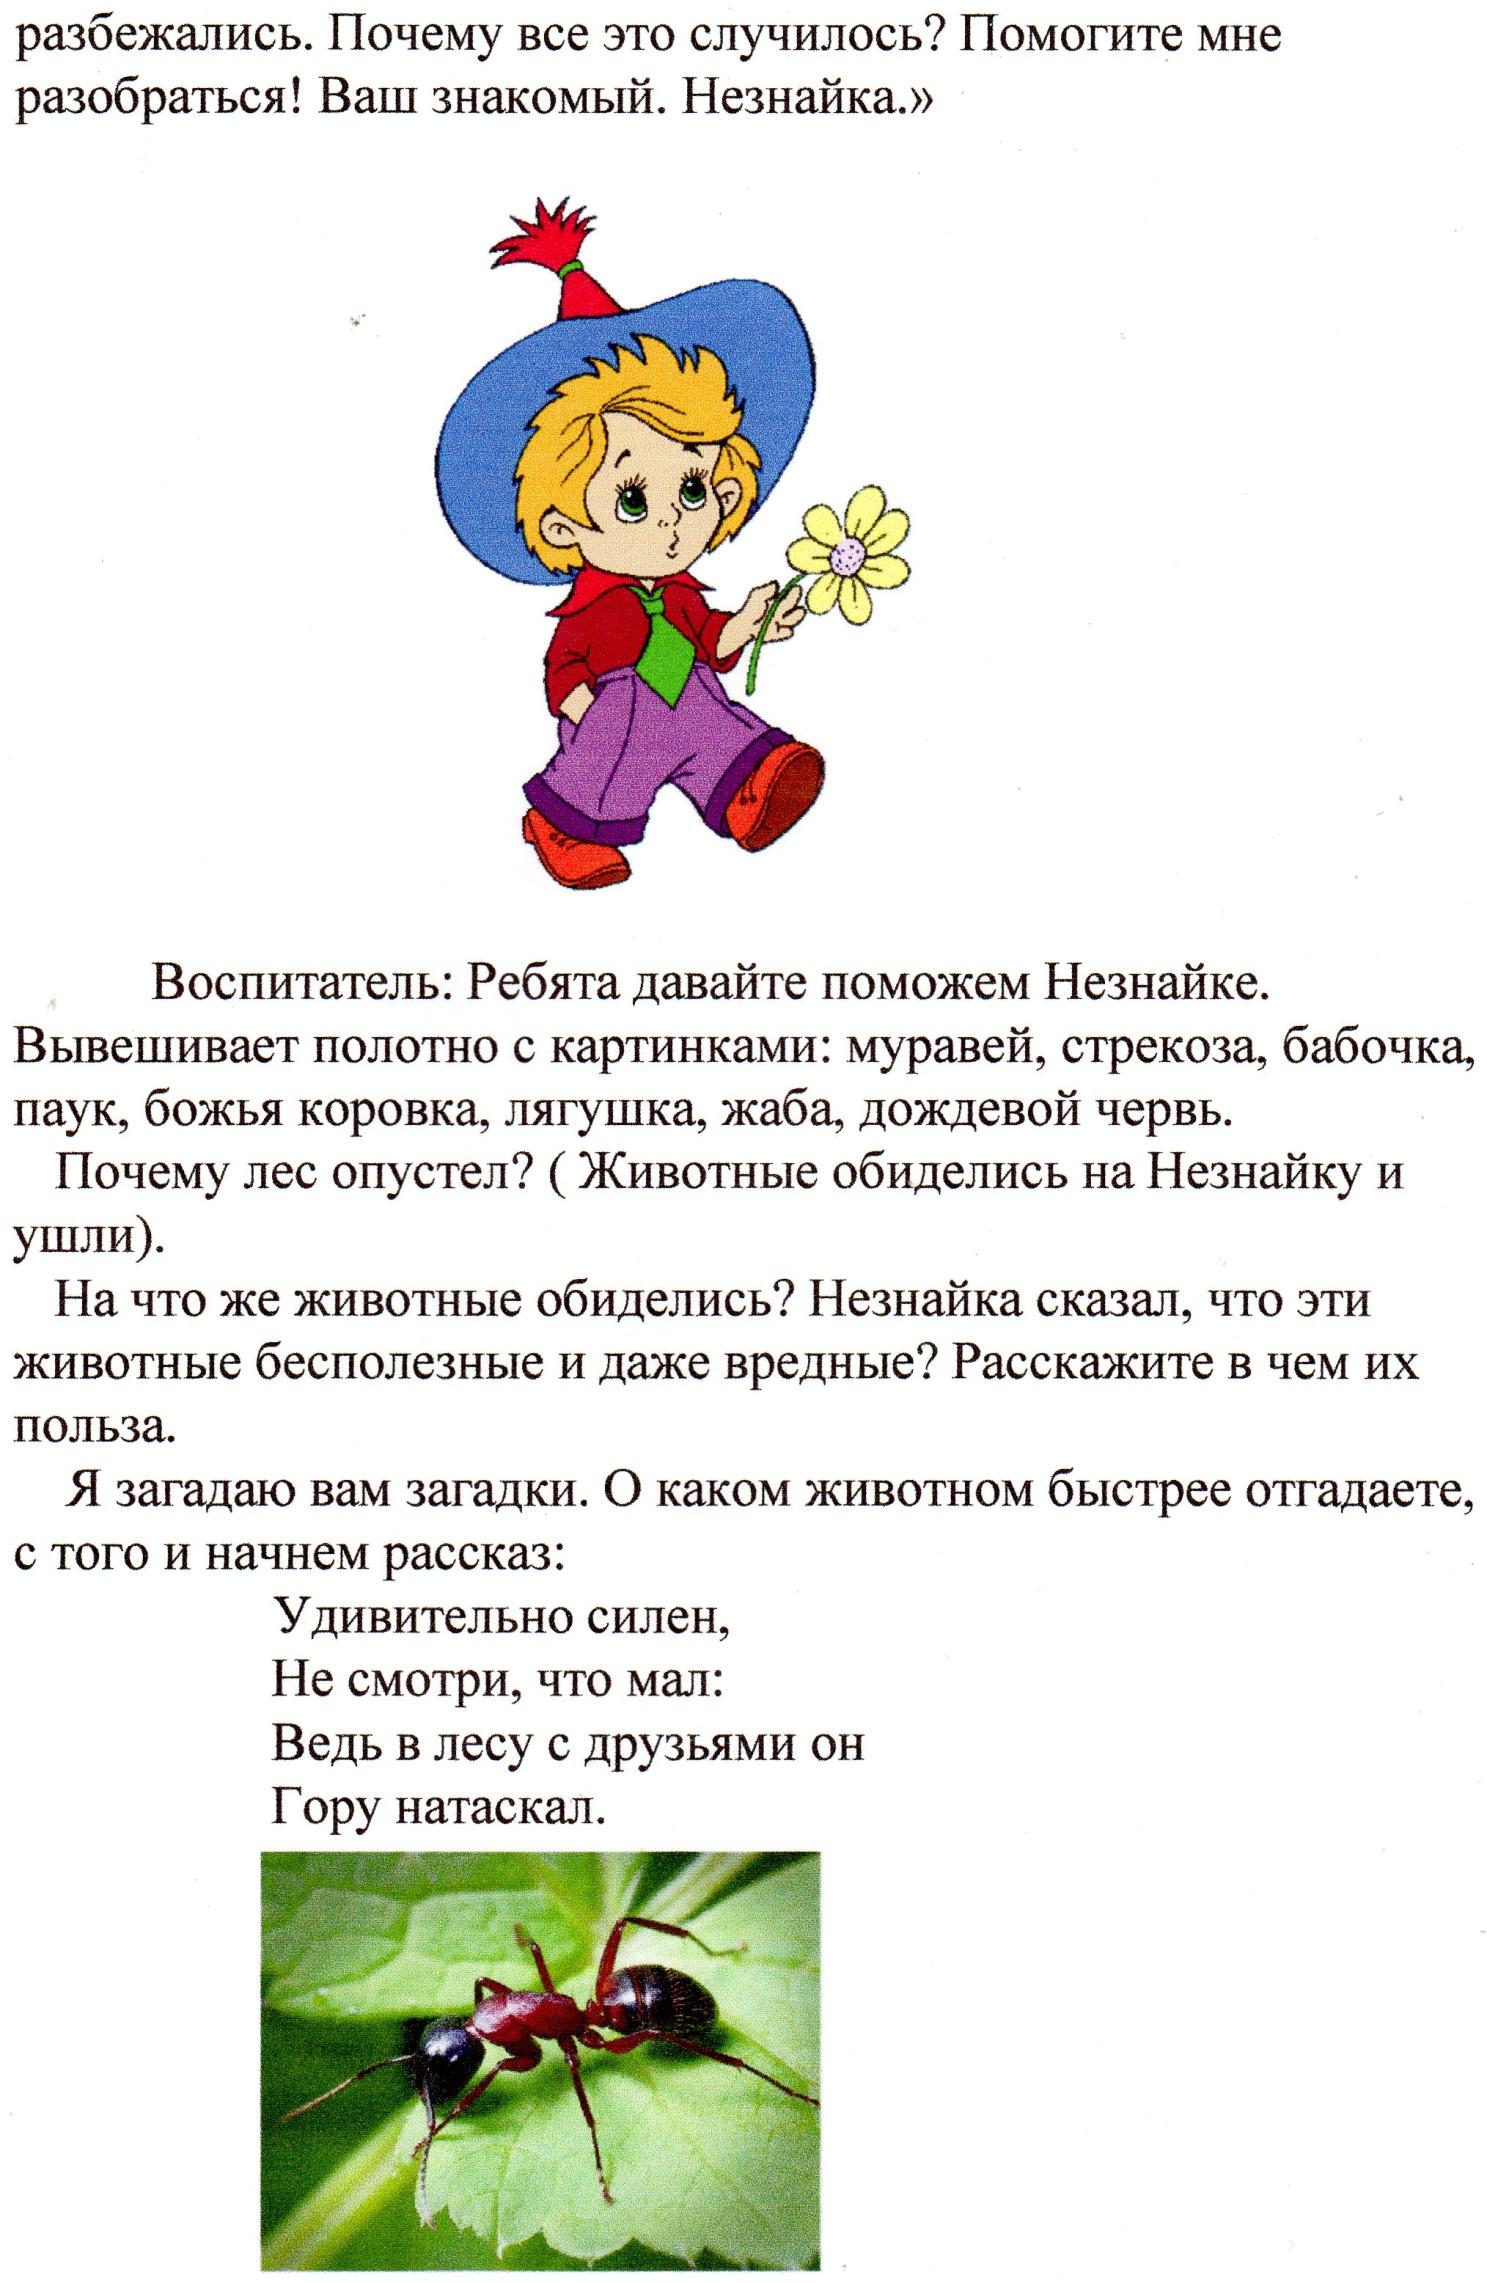 C:\Users\Александр\Pictures\img012.jpg